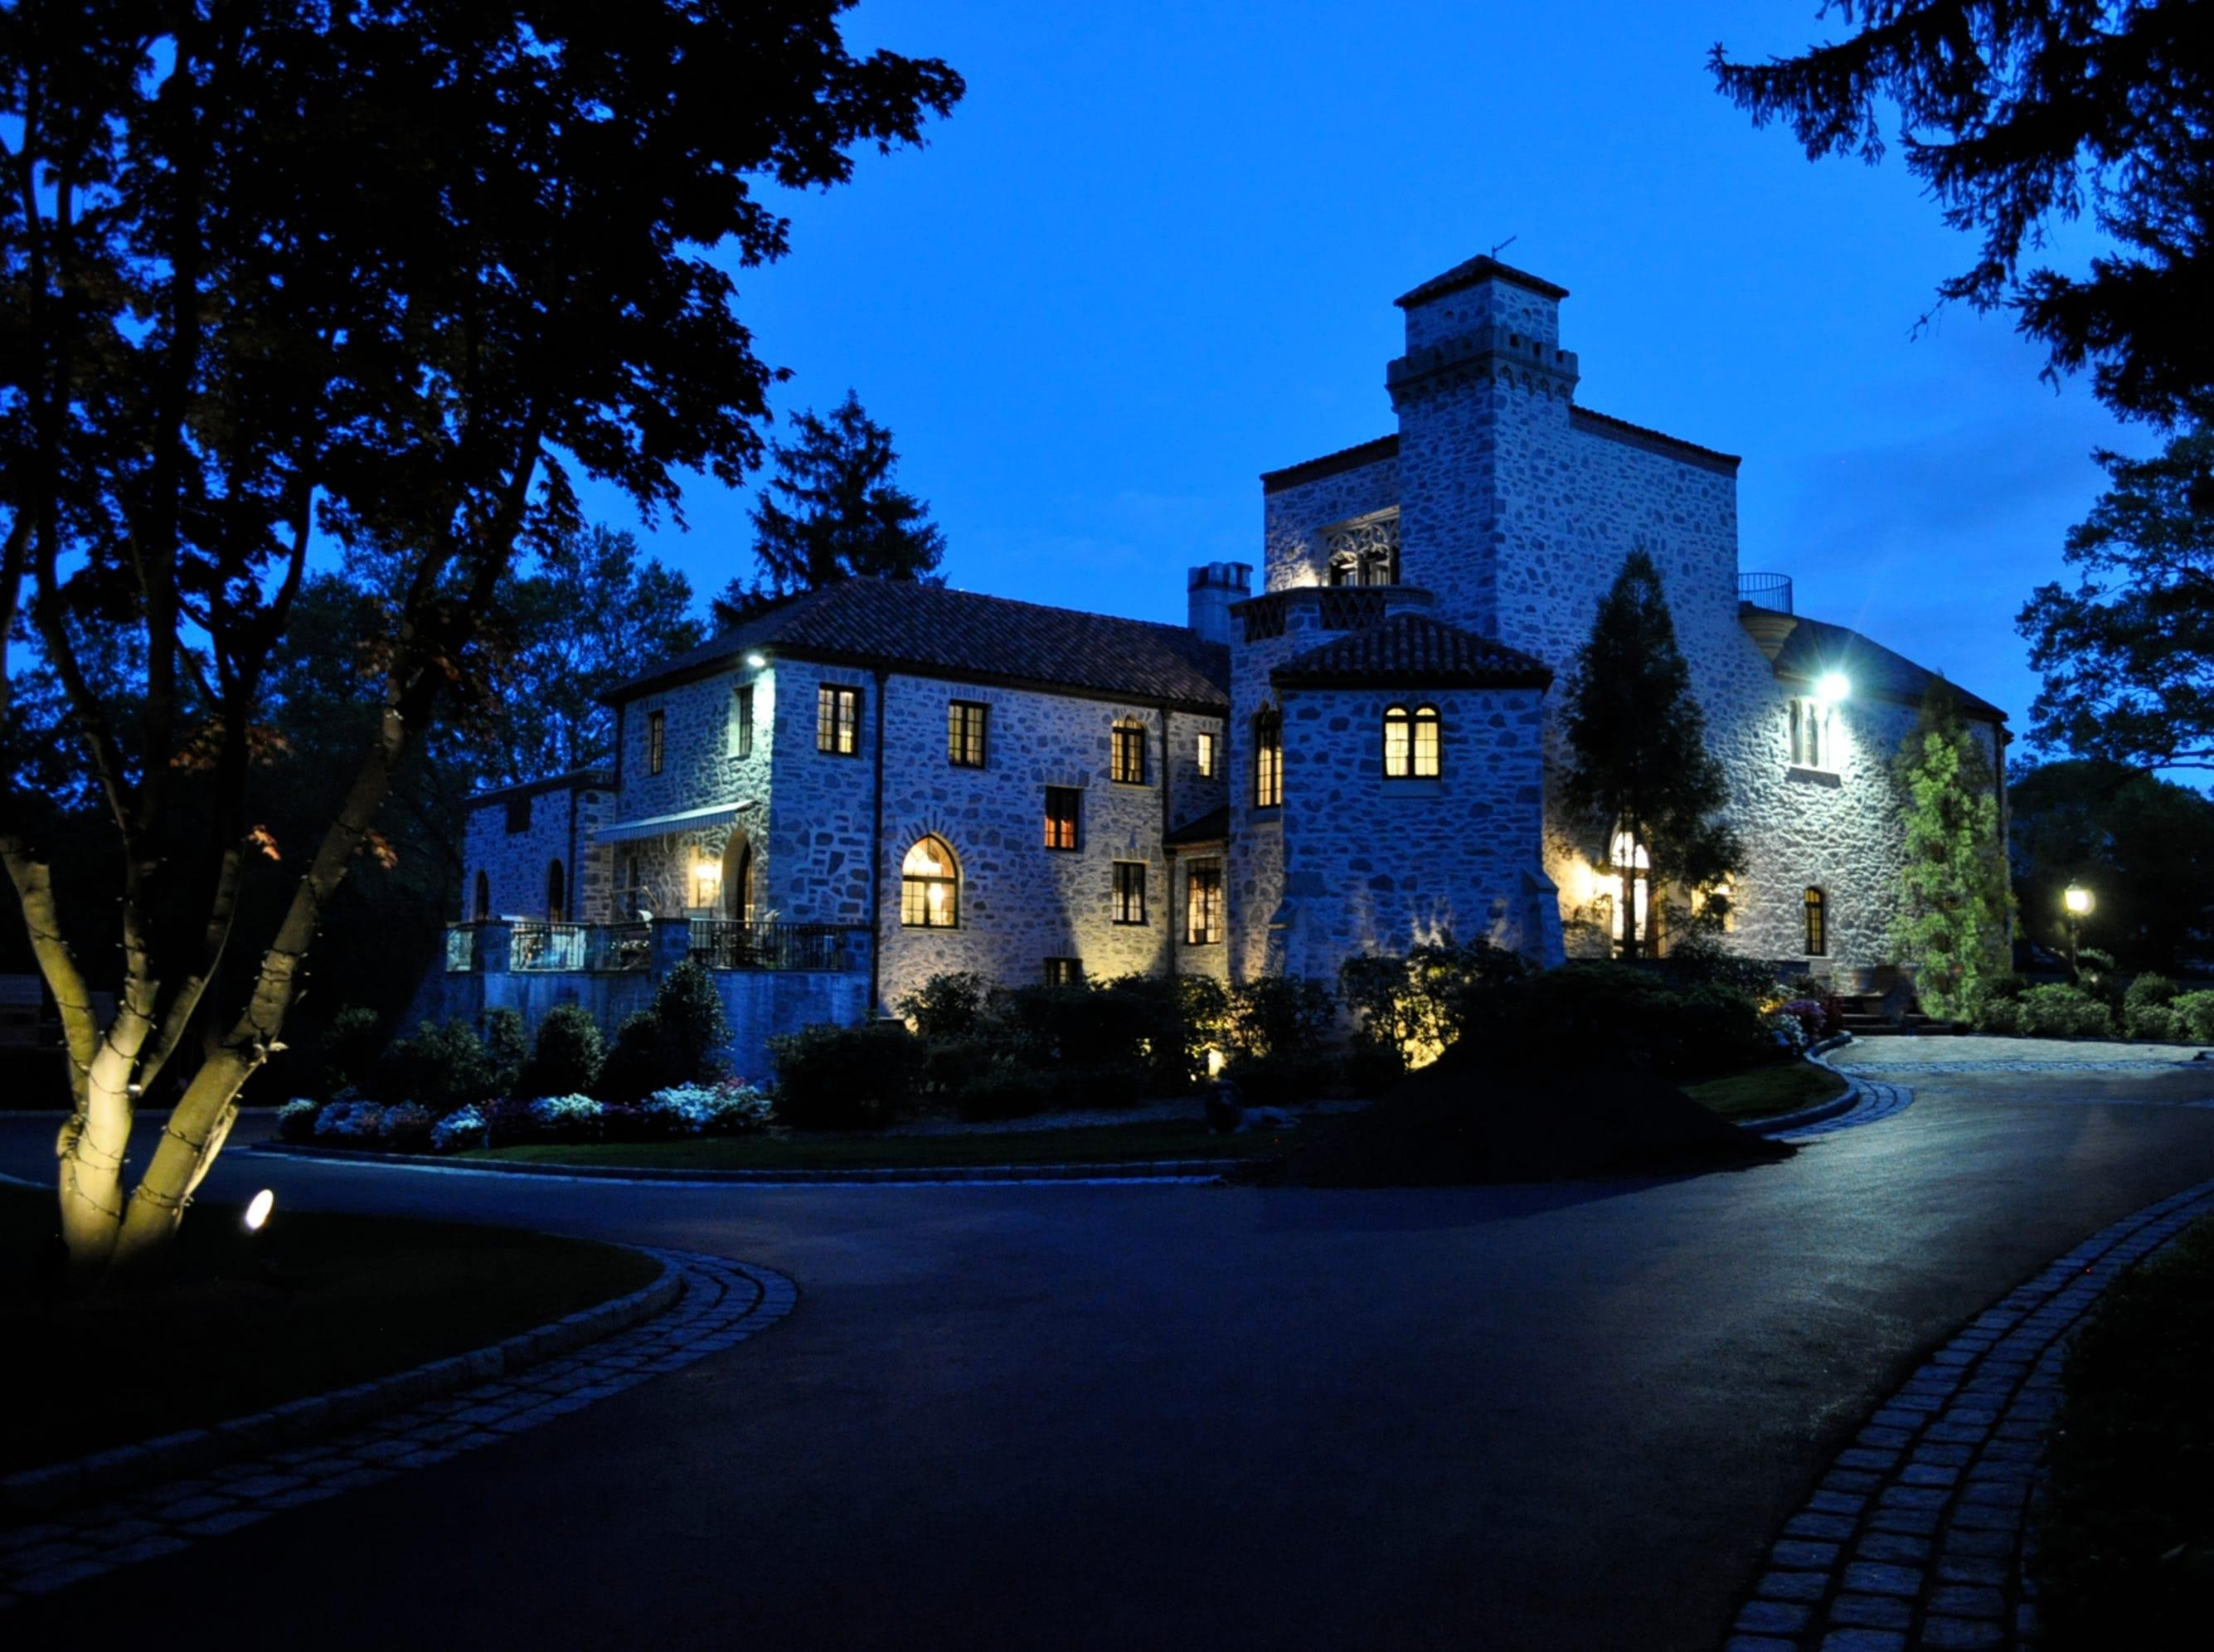 Harrison estate was home to designer of famous Park Avenue buildings